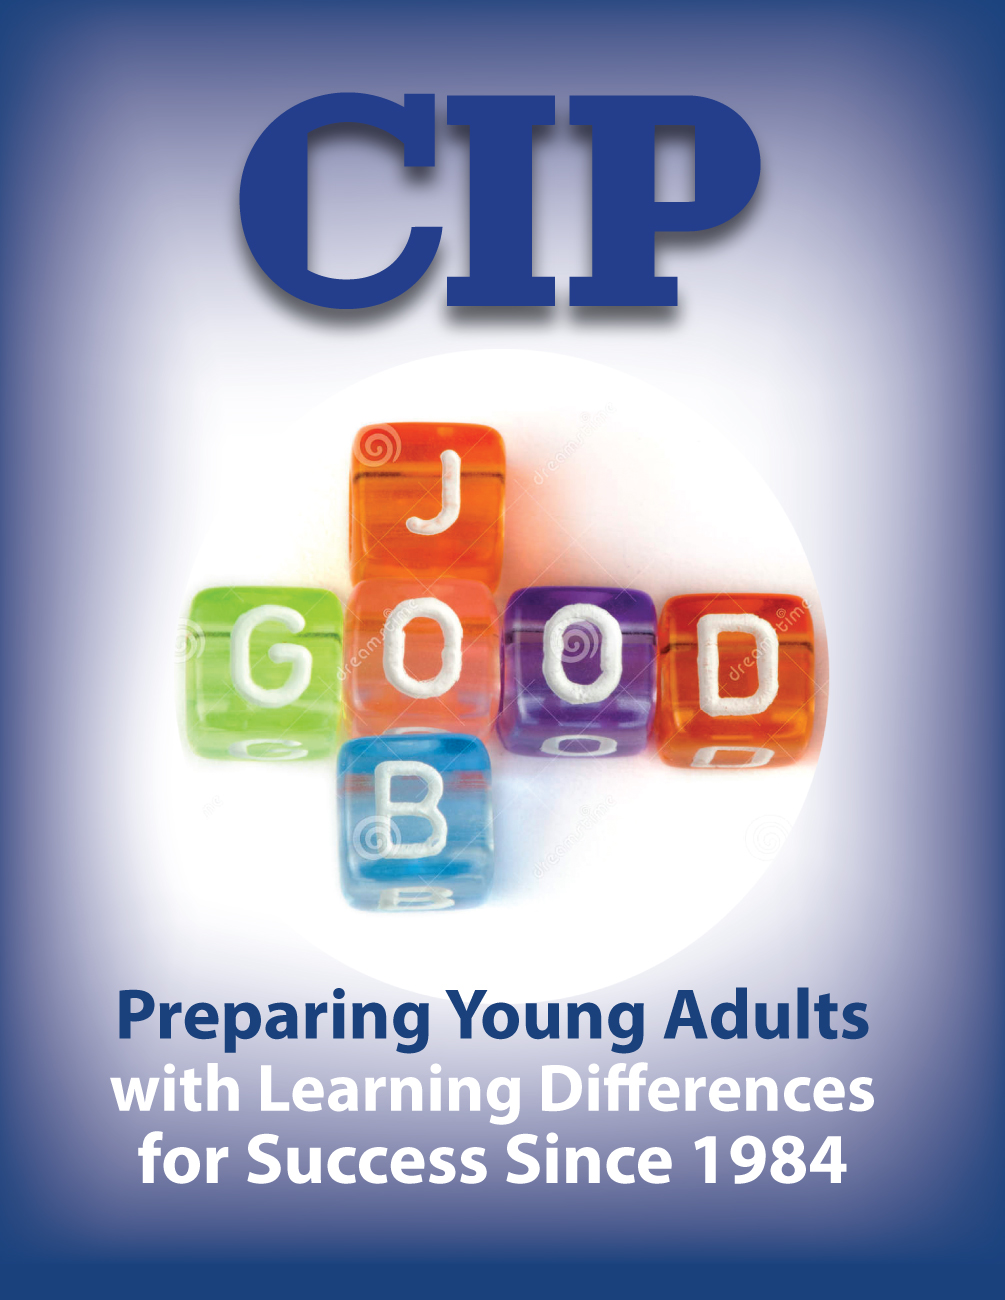 Modern, Bold, Education Book Cover Design for College Internship